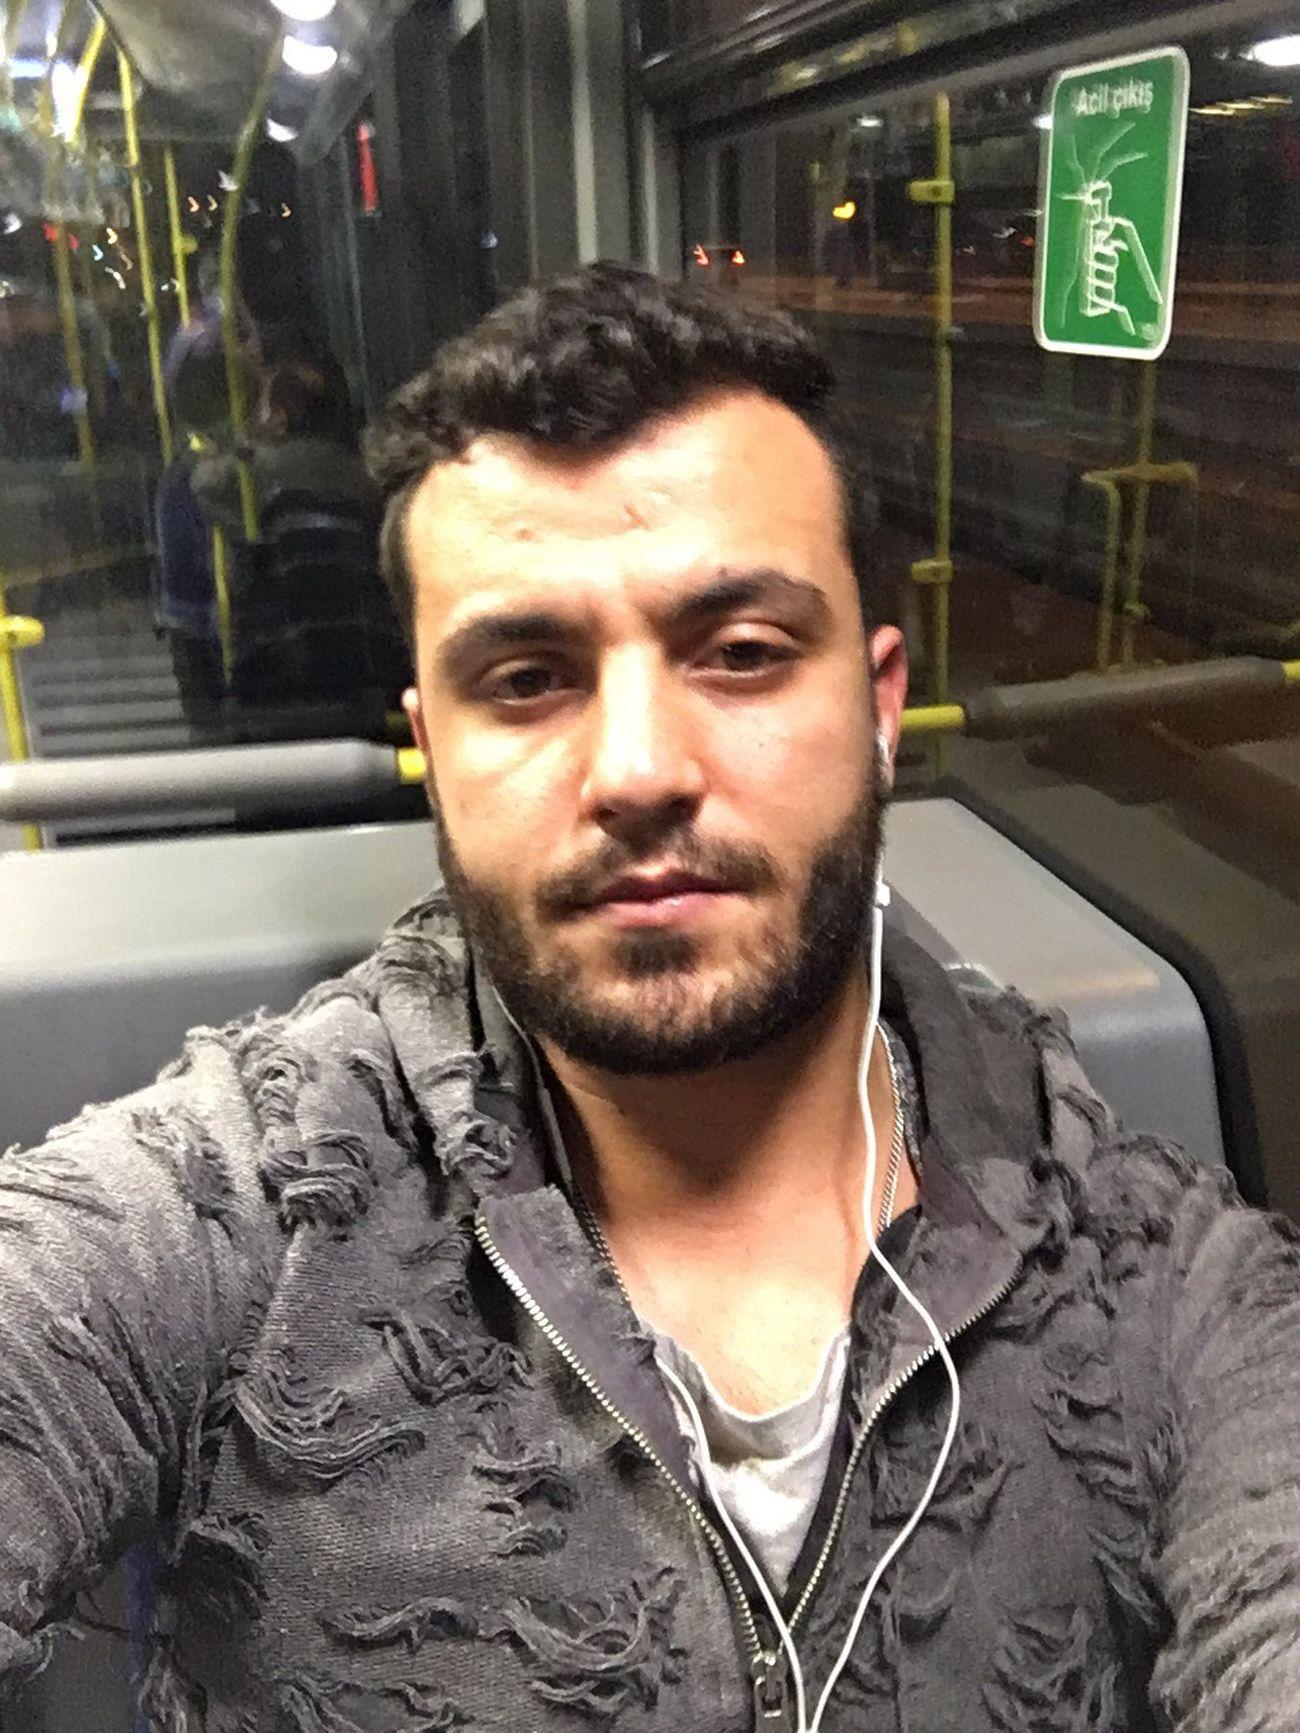 Transportation Public Transportation Subway Train Avcılar Models Selfie ✌ Selfie ♥ Self Portrait Besiktas Bebek Taksim Istanbul Model Tattoo Barmen Müzik Modeling Selfi Bar Clup 🎈👻